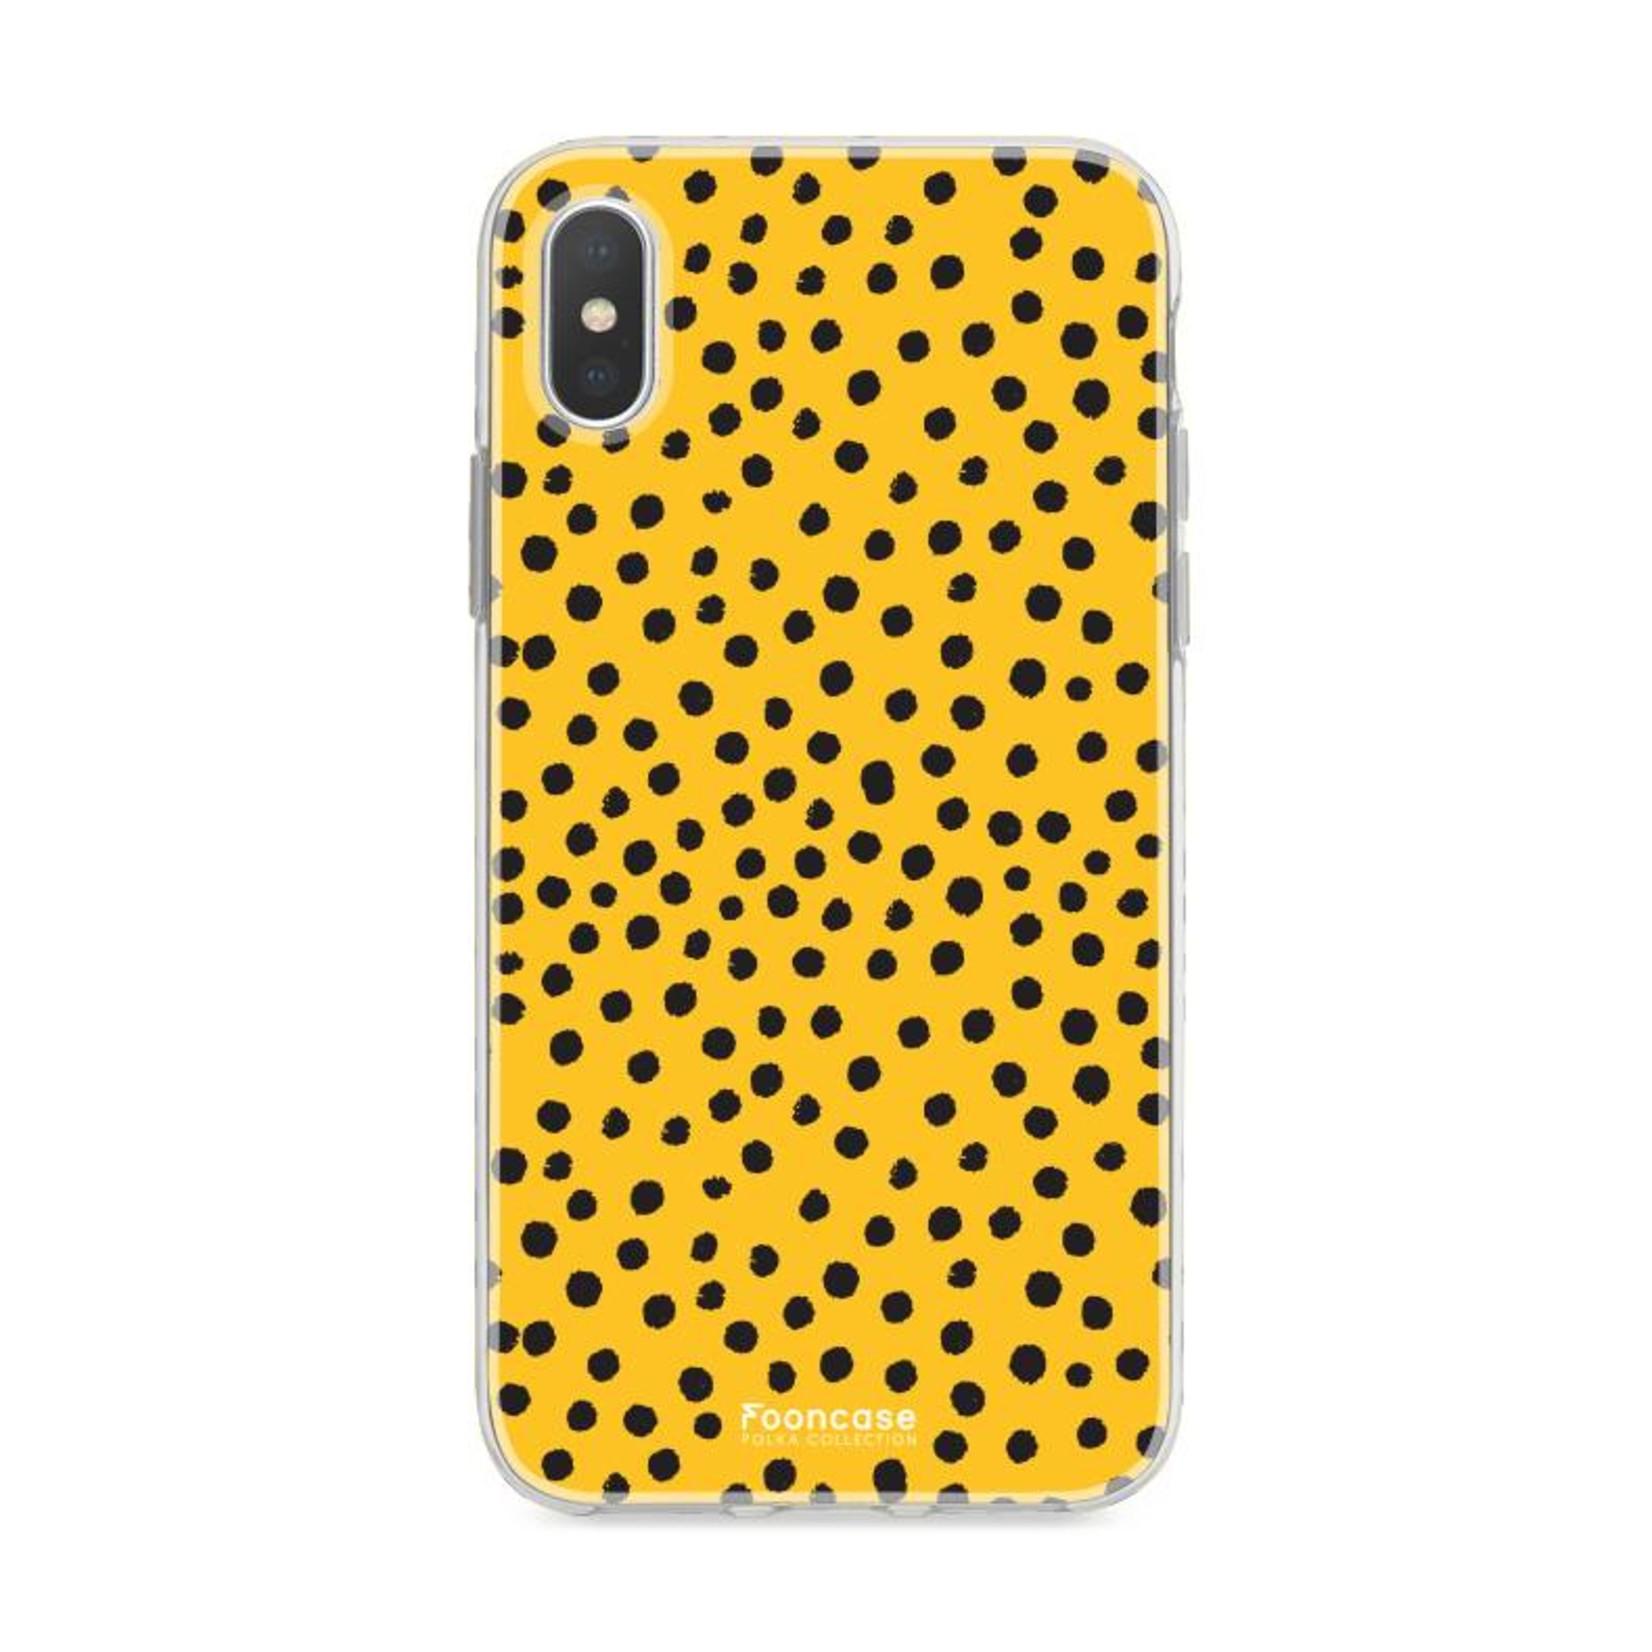 FOONCASE iPhone XS hoesje TPU Soft Case - Back Cover - POLKA COLLECTION / Stipjes / Stippen / Oker Geel